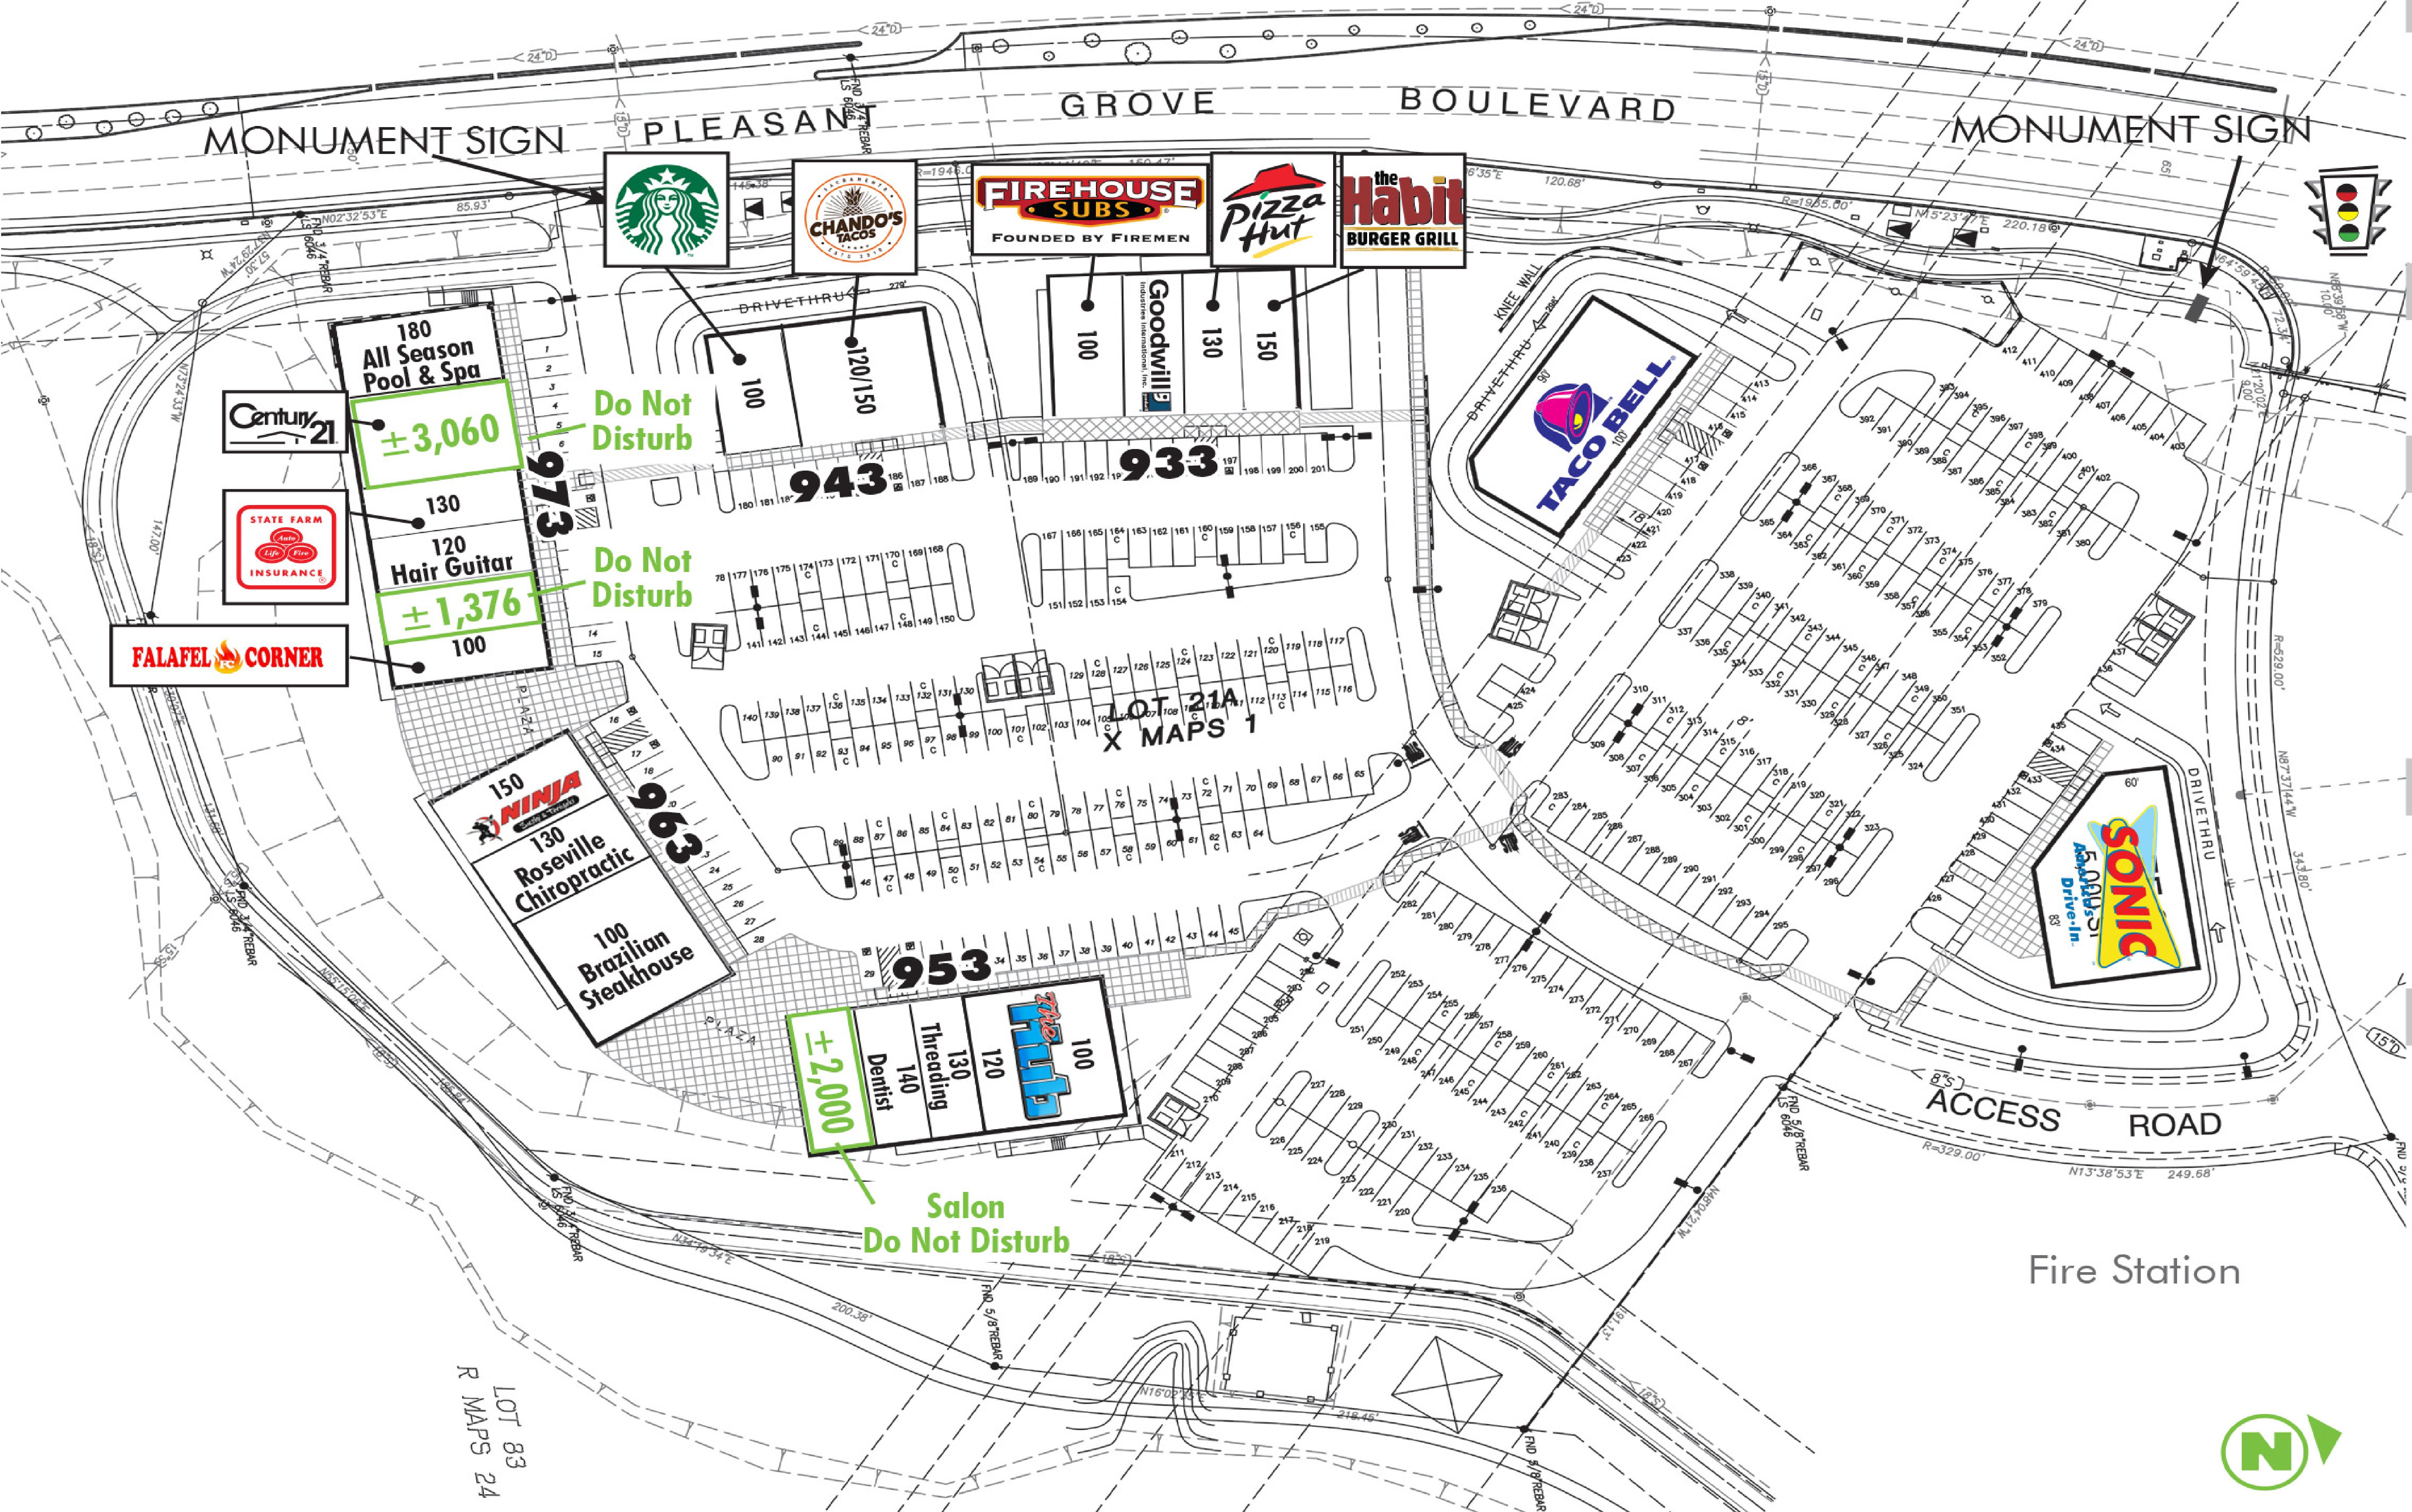 Pleasant Grove Pointe: site plan